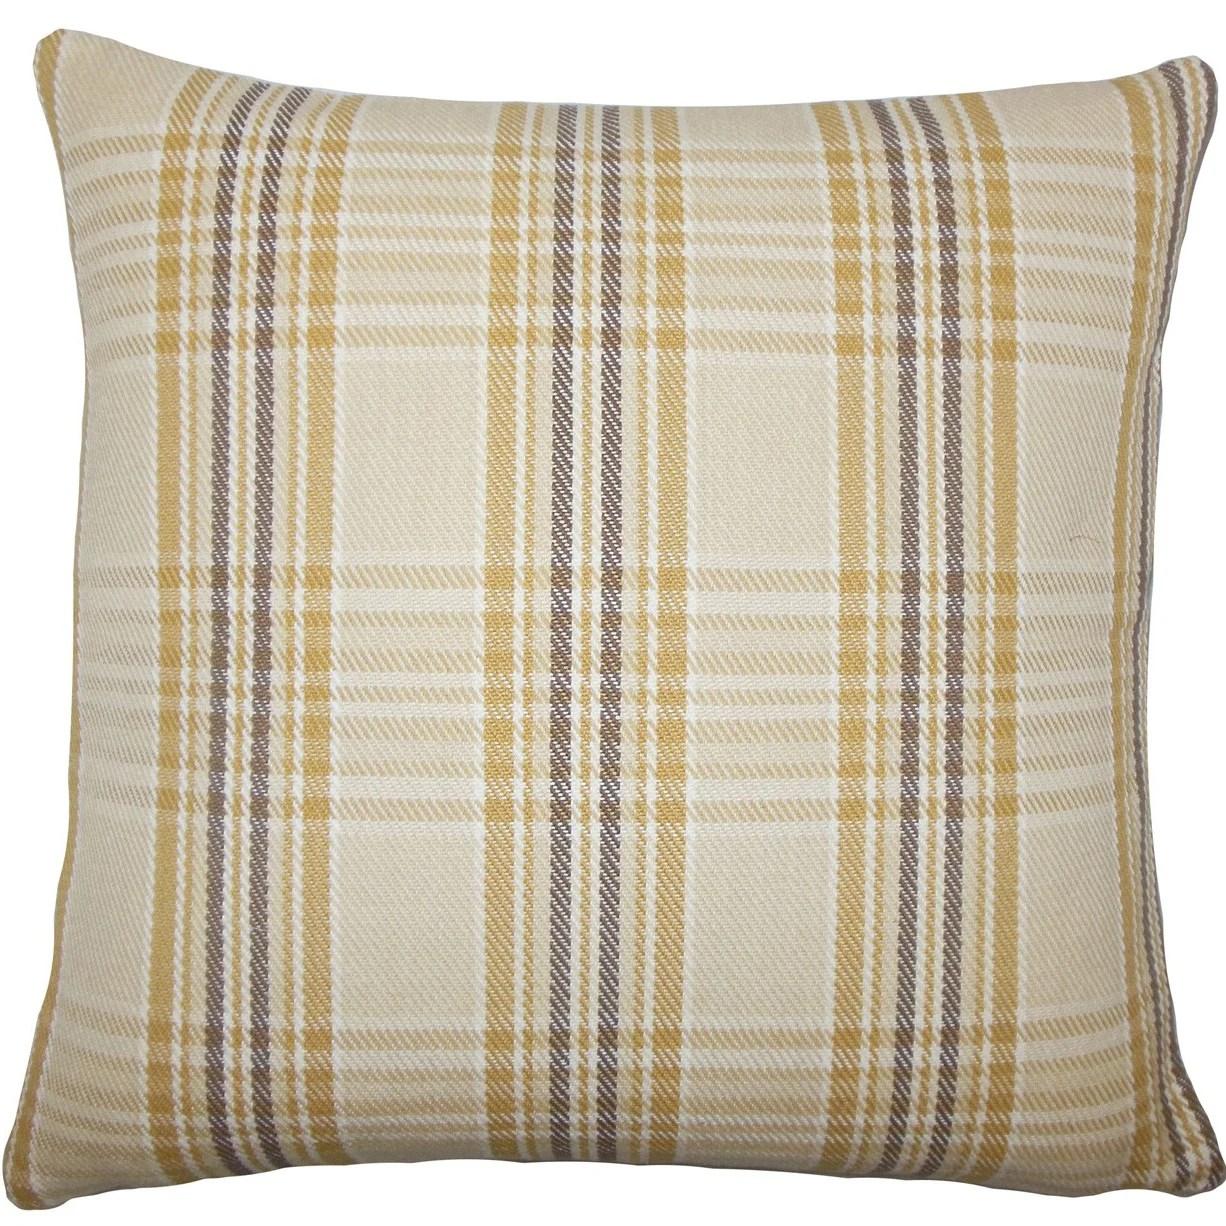 The Pillow Collection Mahlah Plaid Cotton Throw Pillow